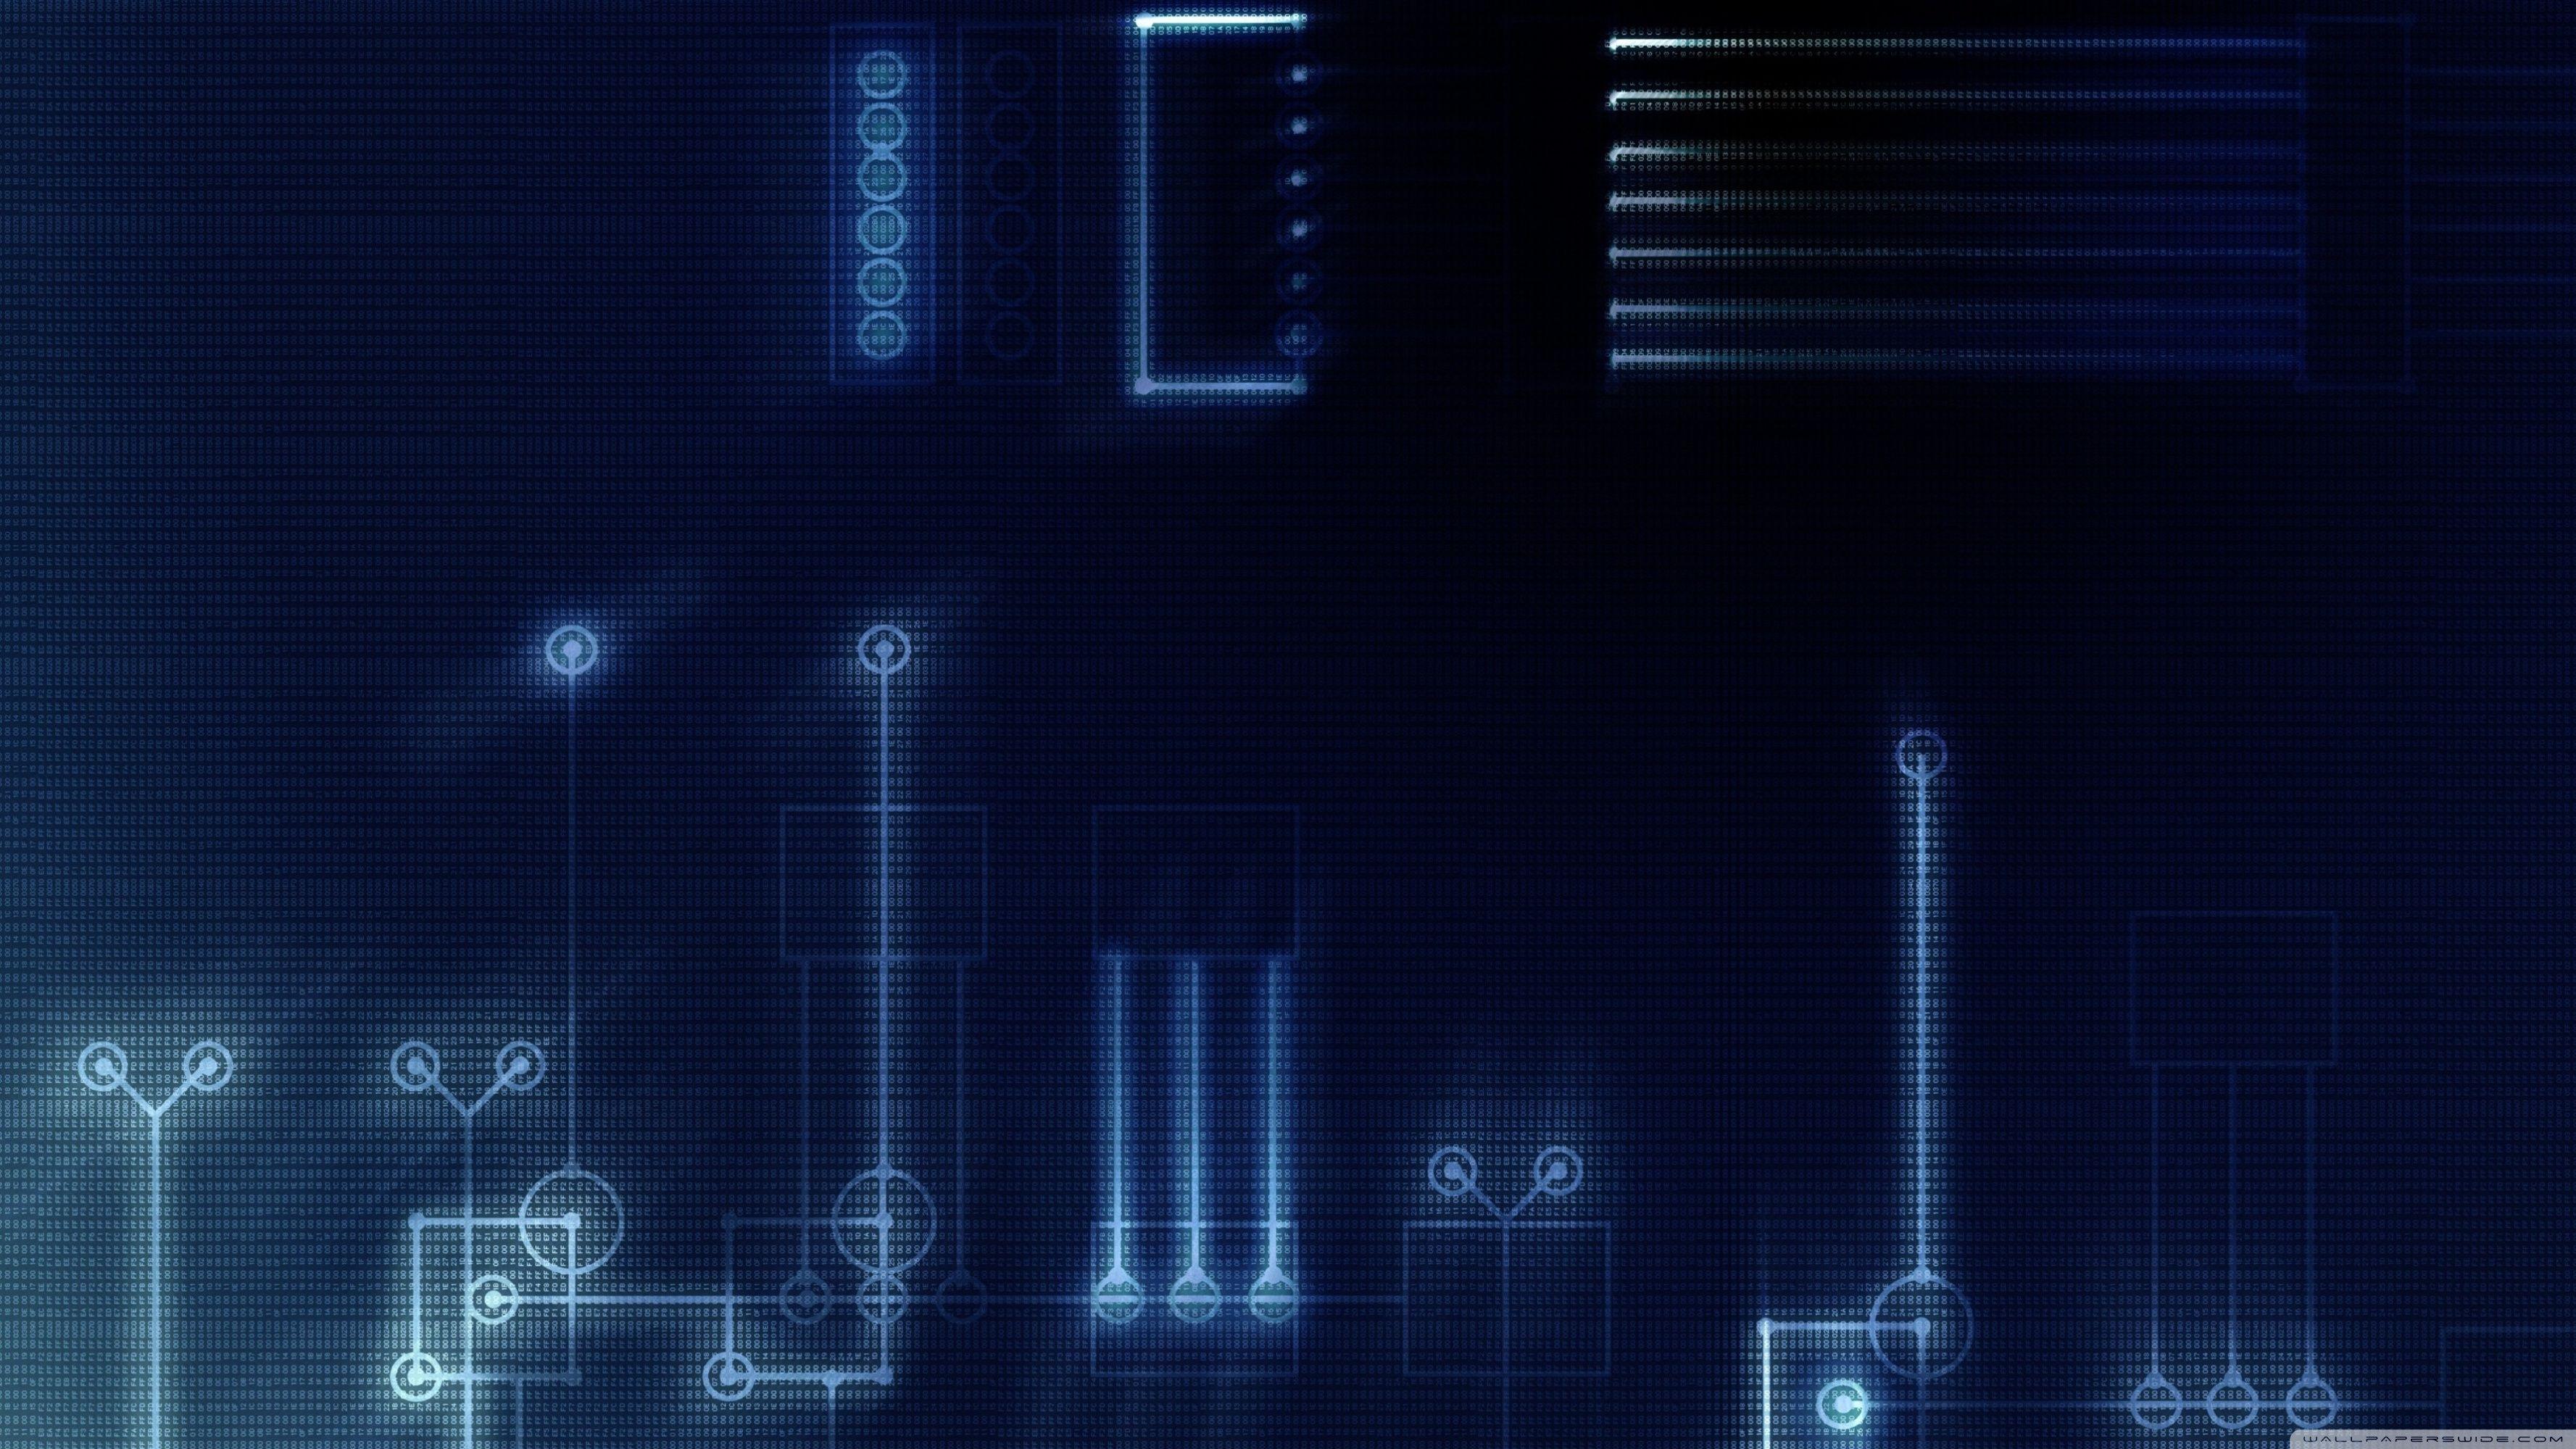 Technology Background Laptop: High-Tech 4K Wallpapers